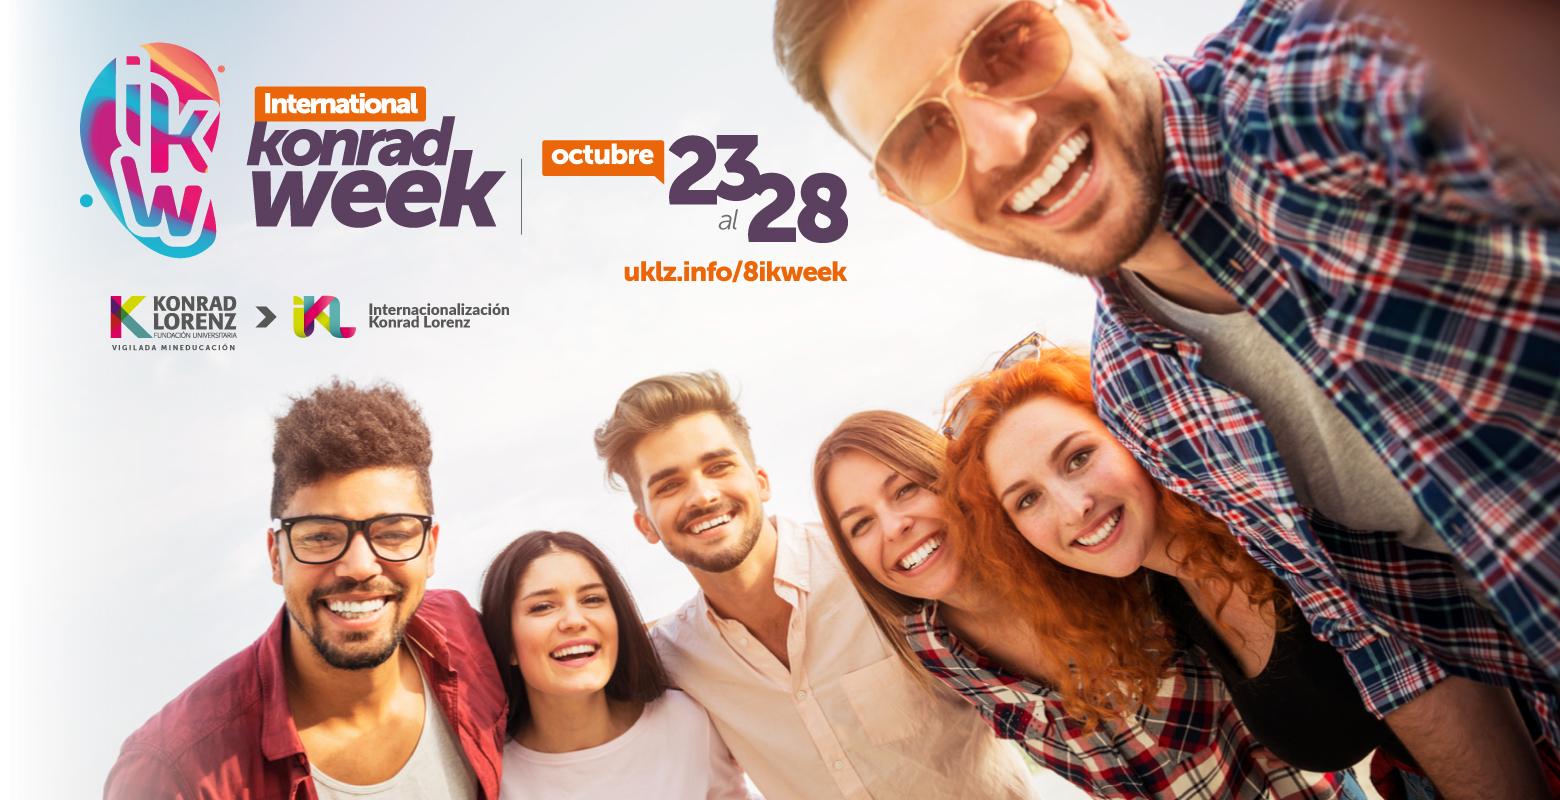 VIII International Konrad Week